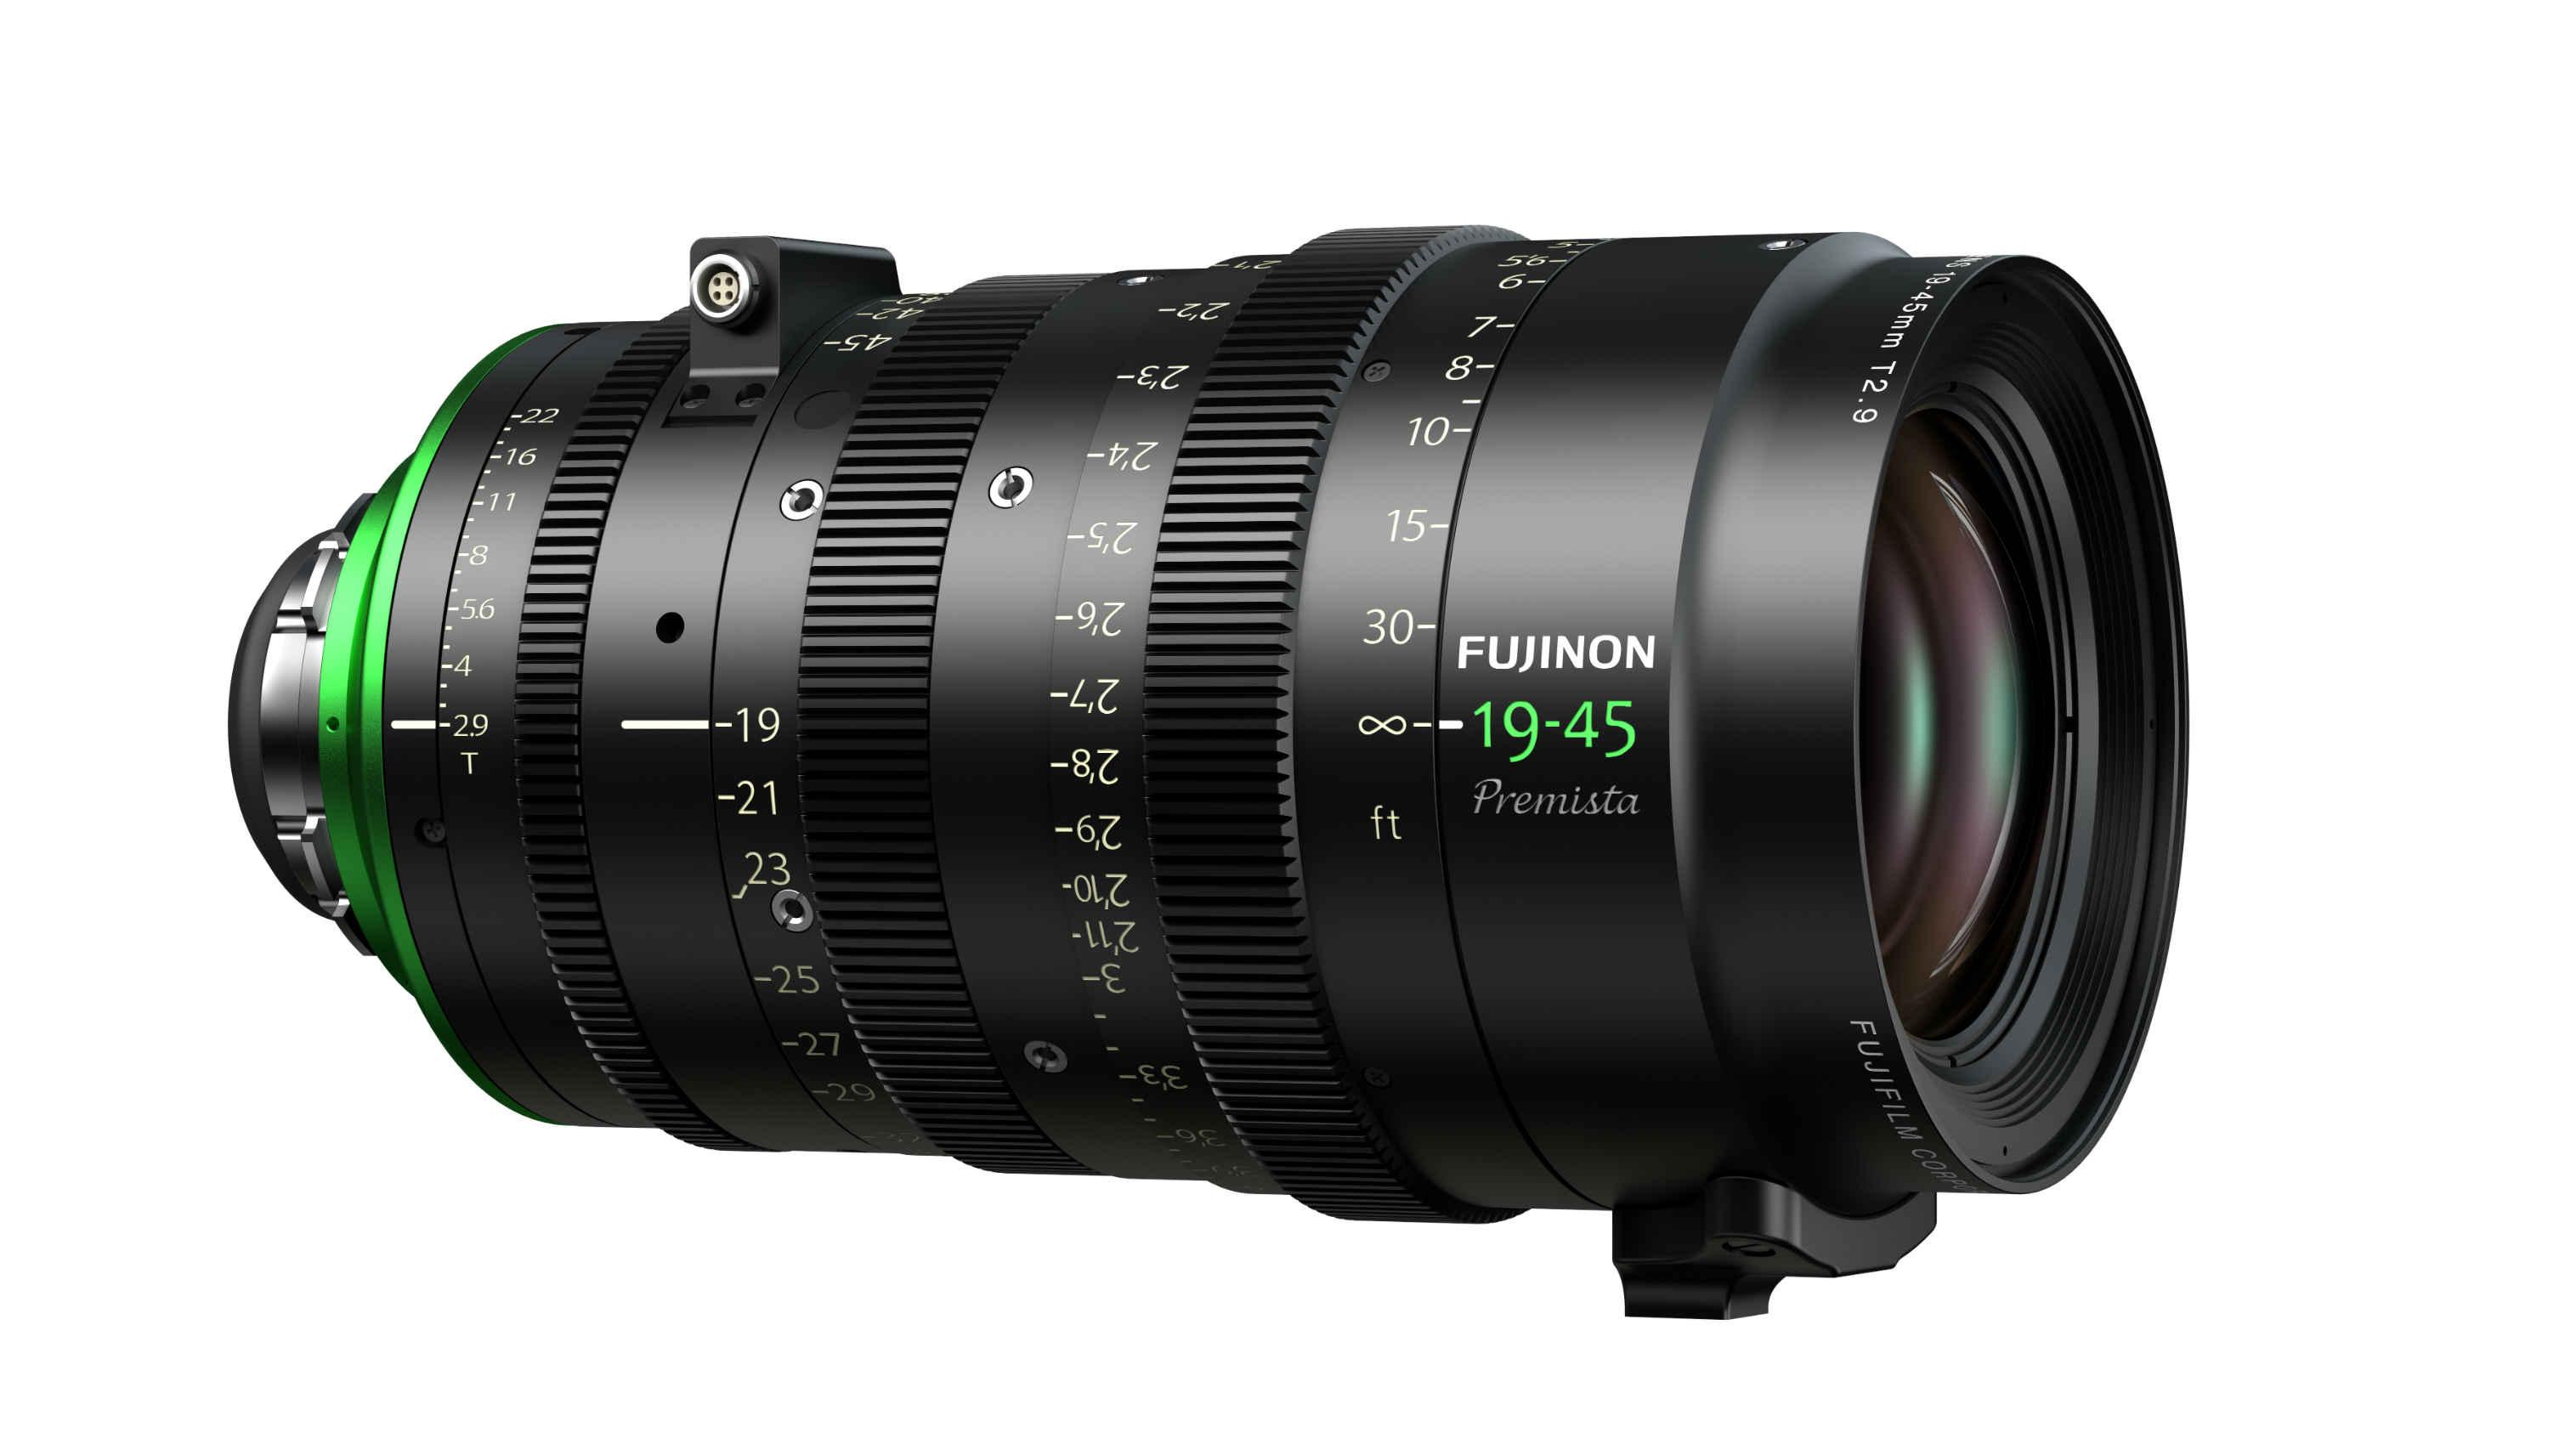 Premista 19-45mm